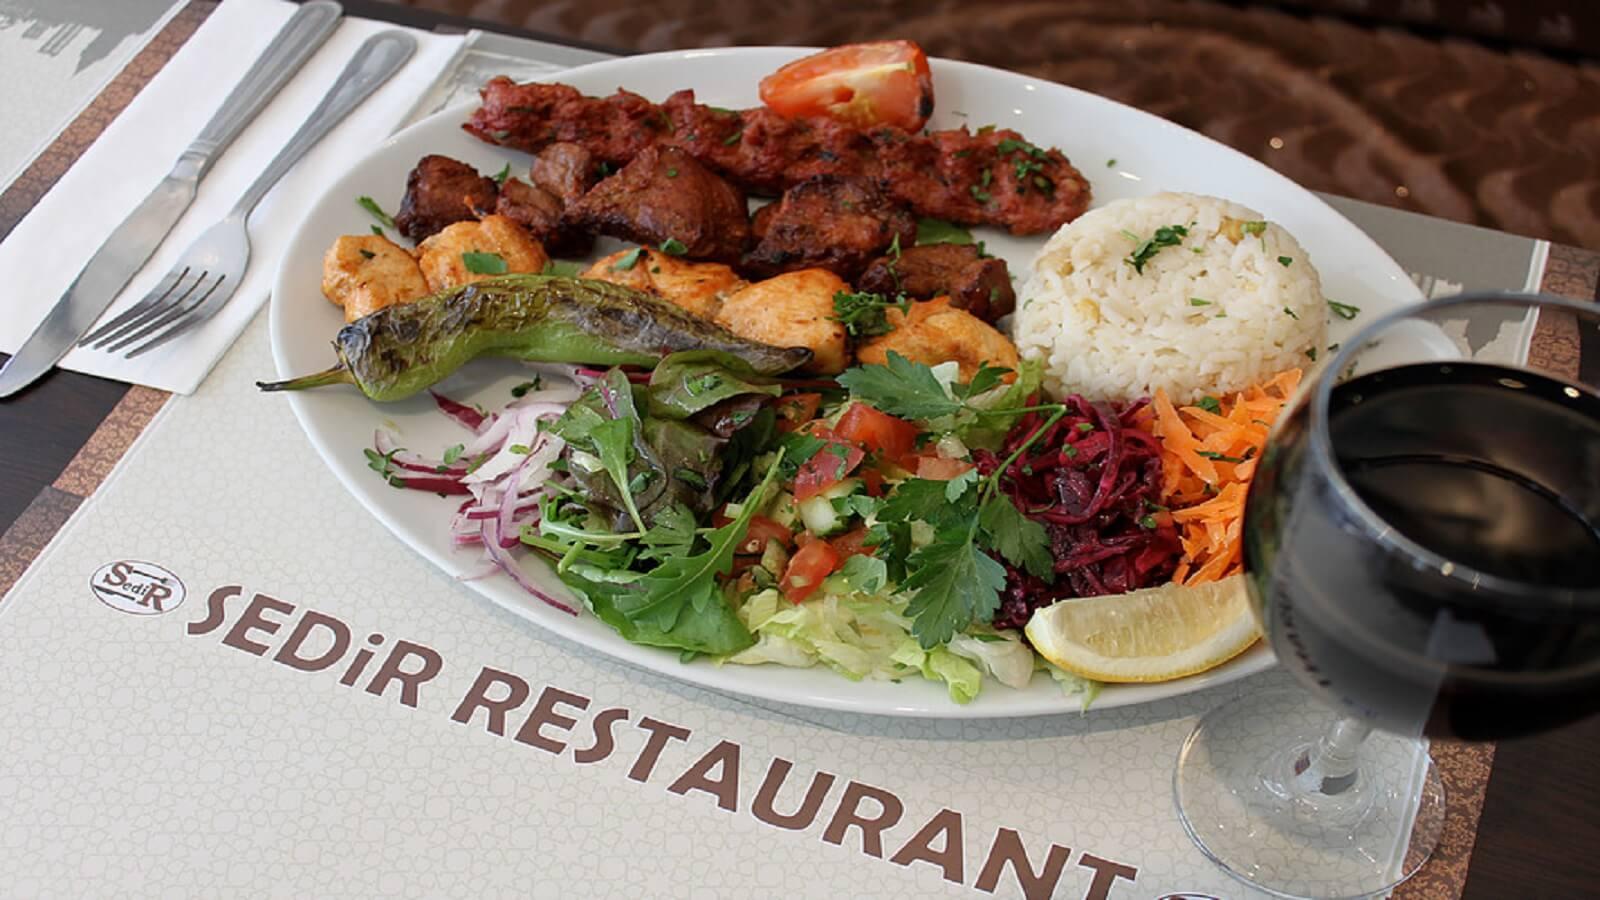 Sedir Restaurant